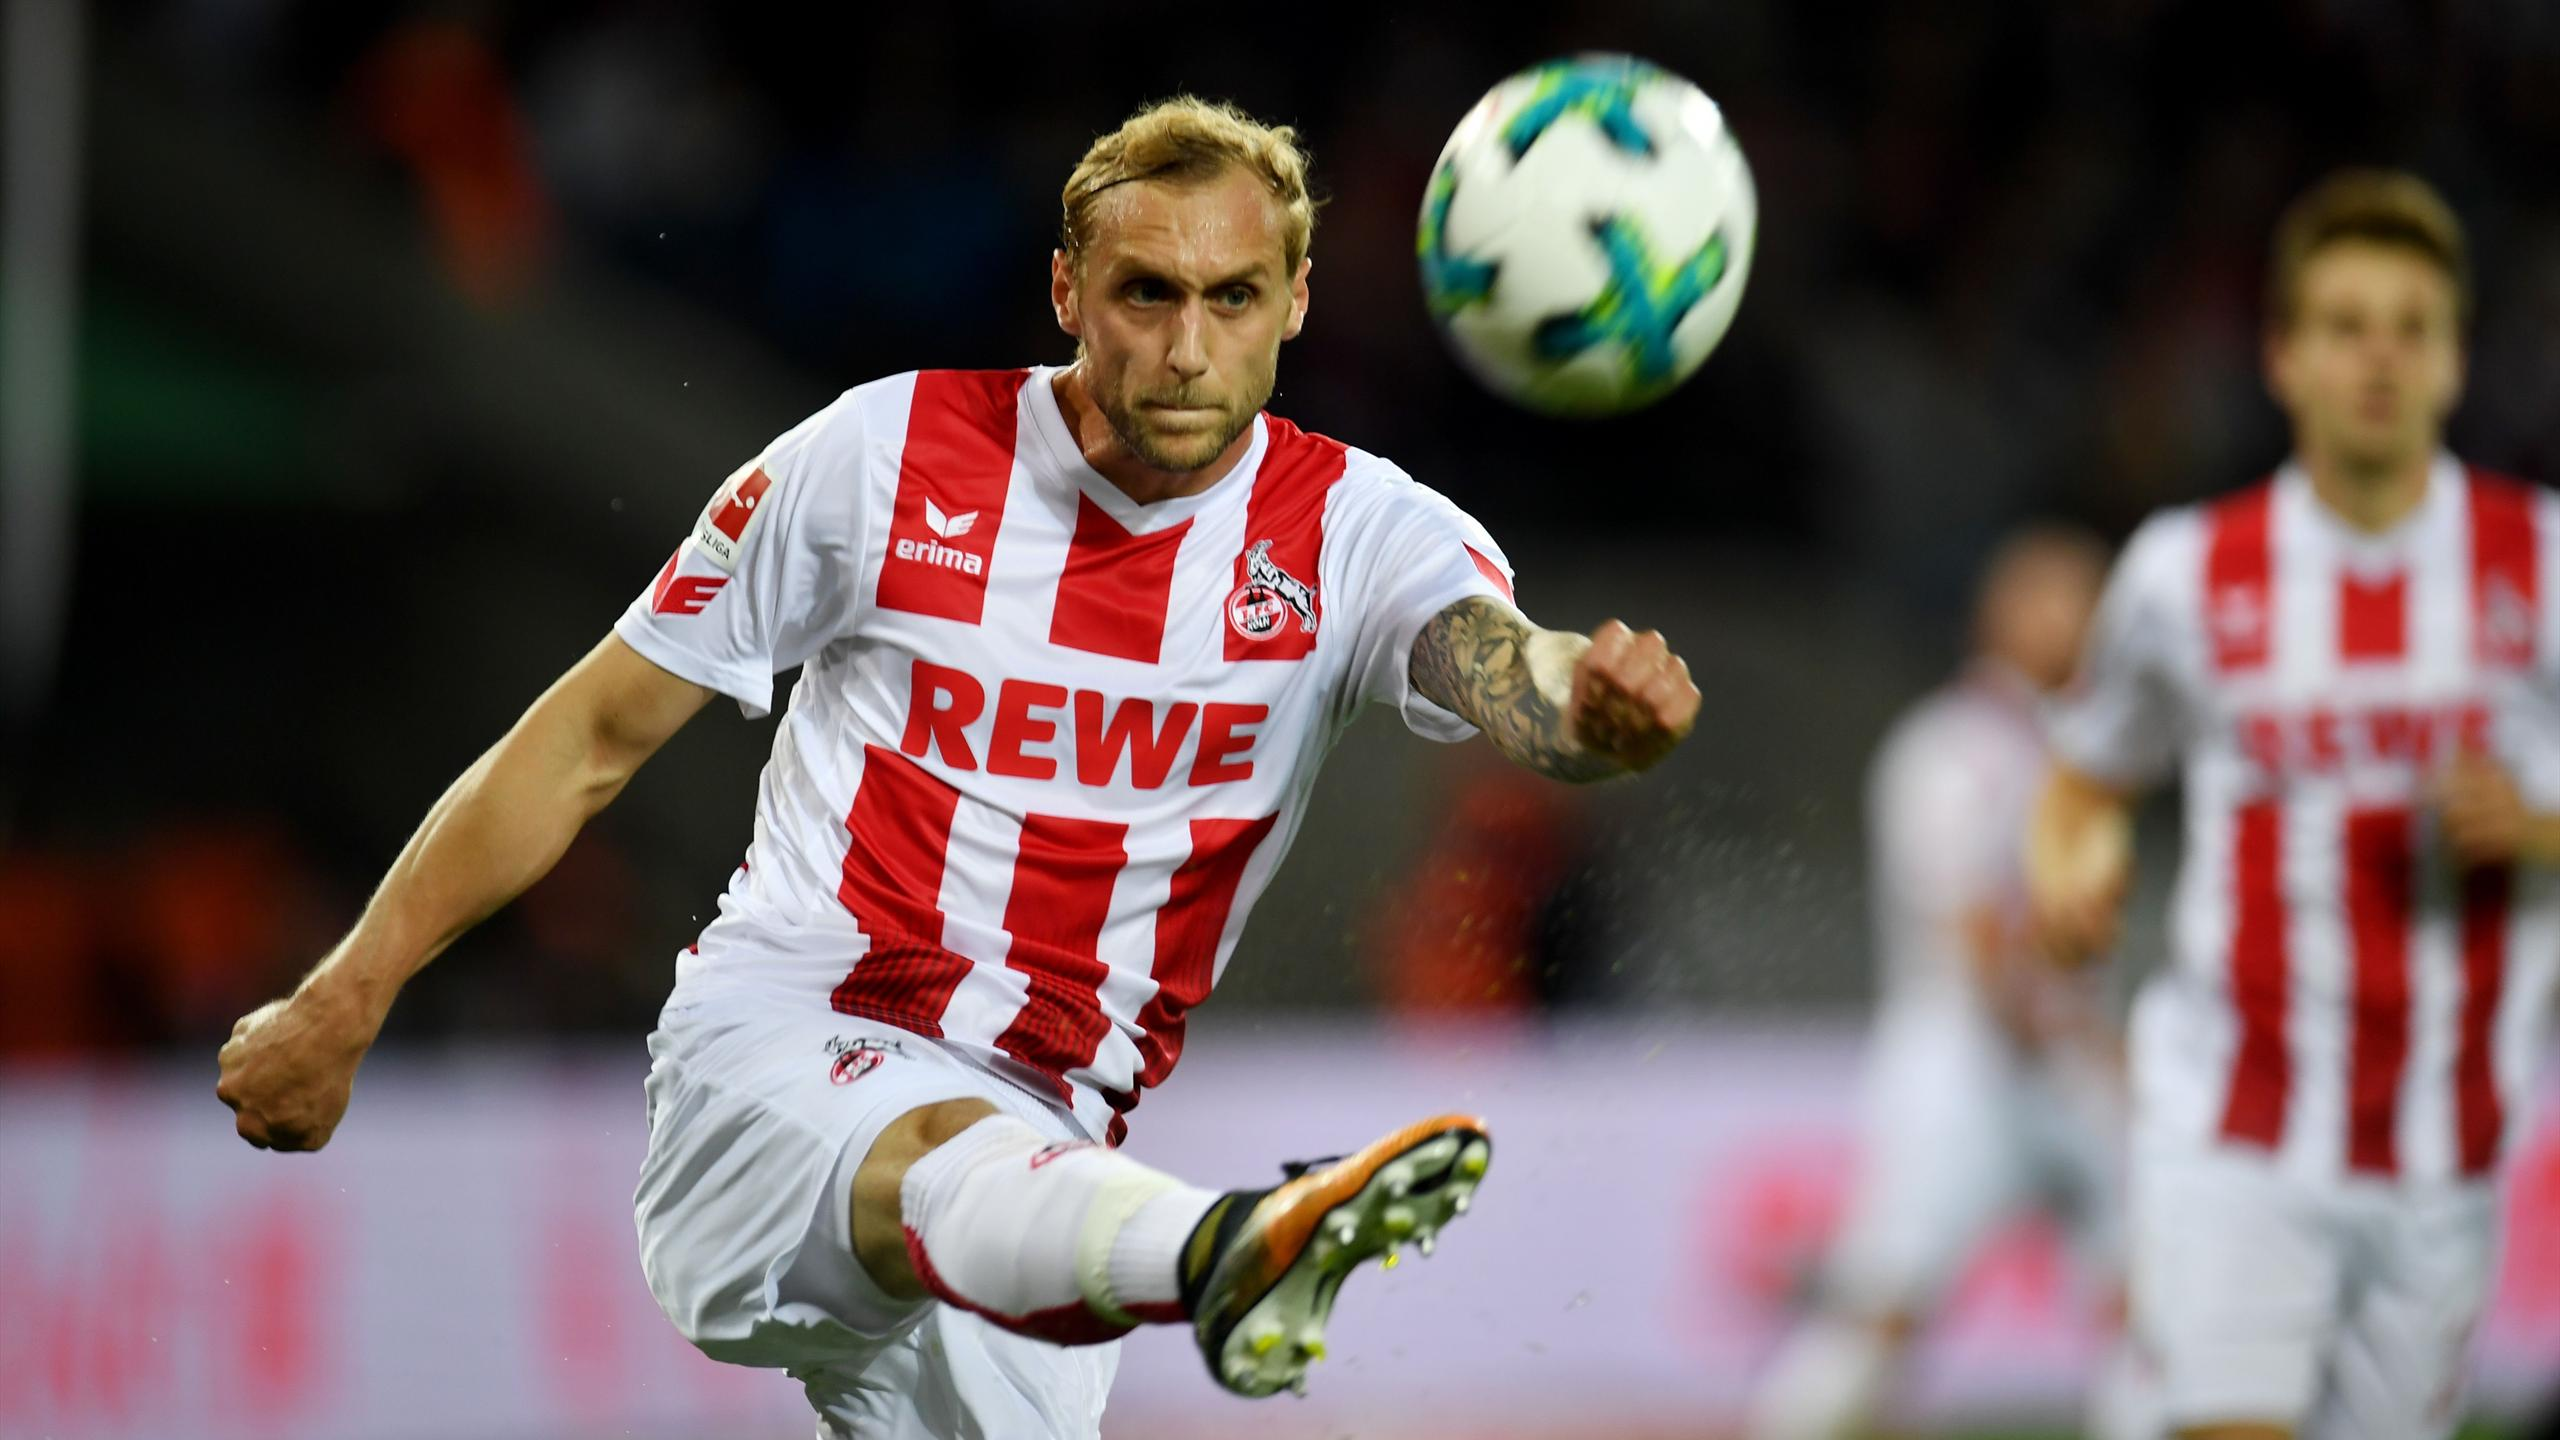 Freitagsspiel 1. Bundesliga